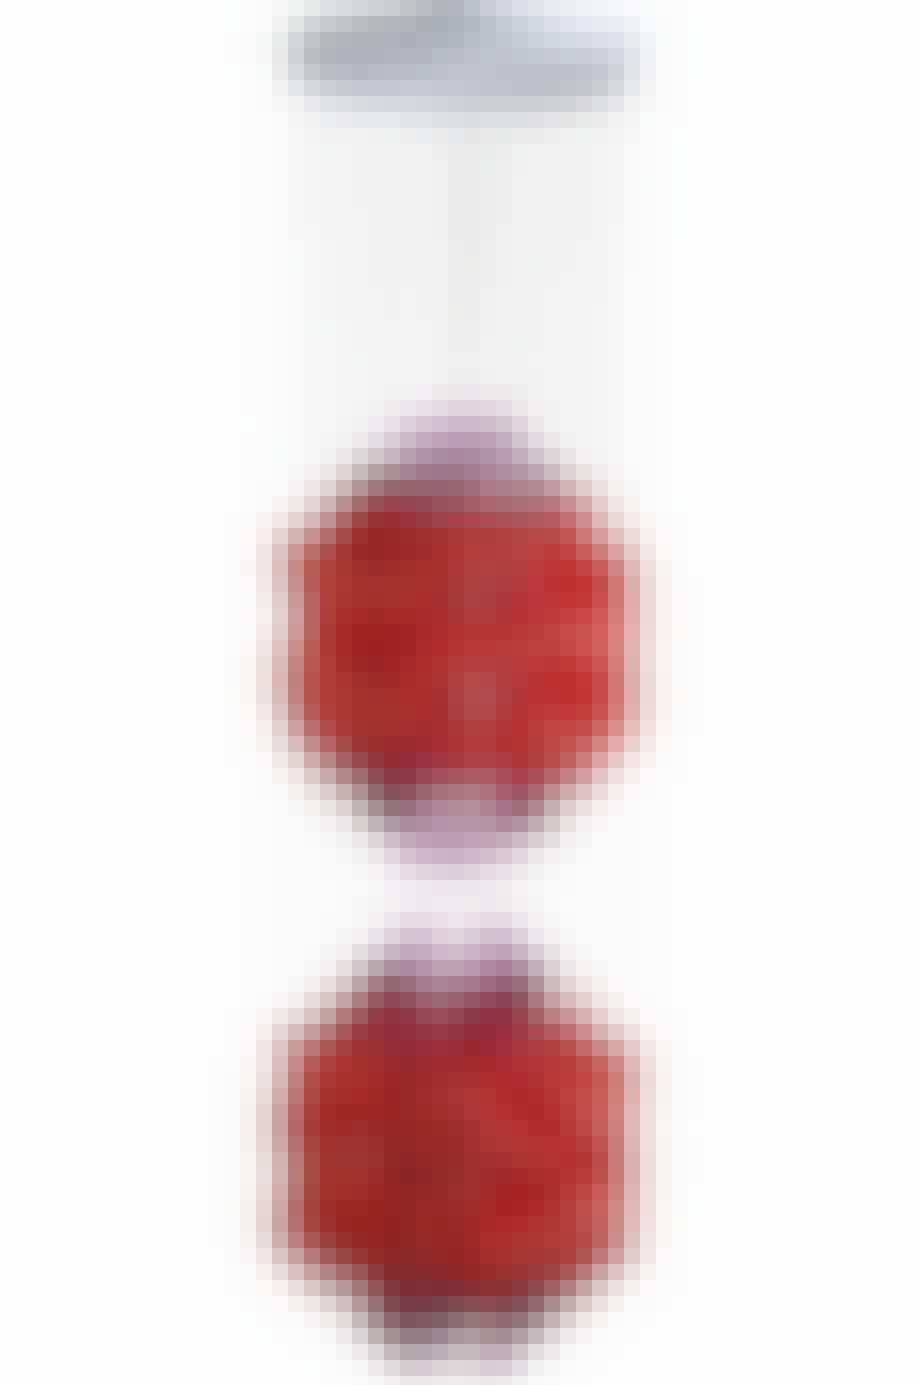 Spiral SP2 Multi-colour, Hangig lamp